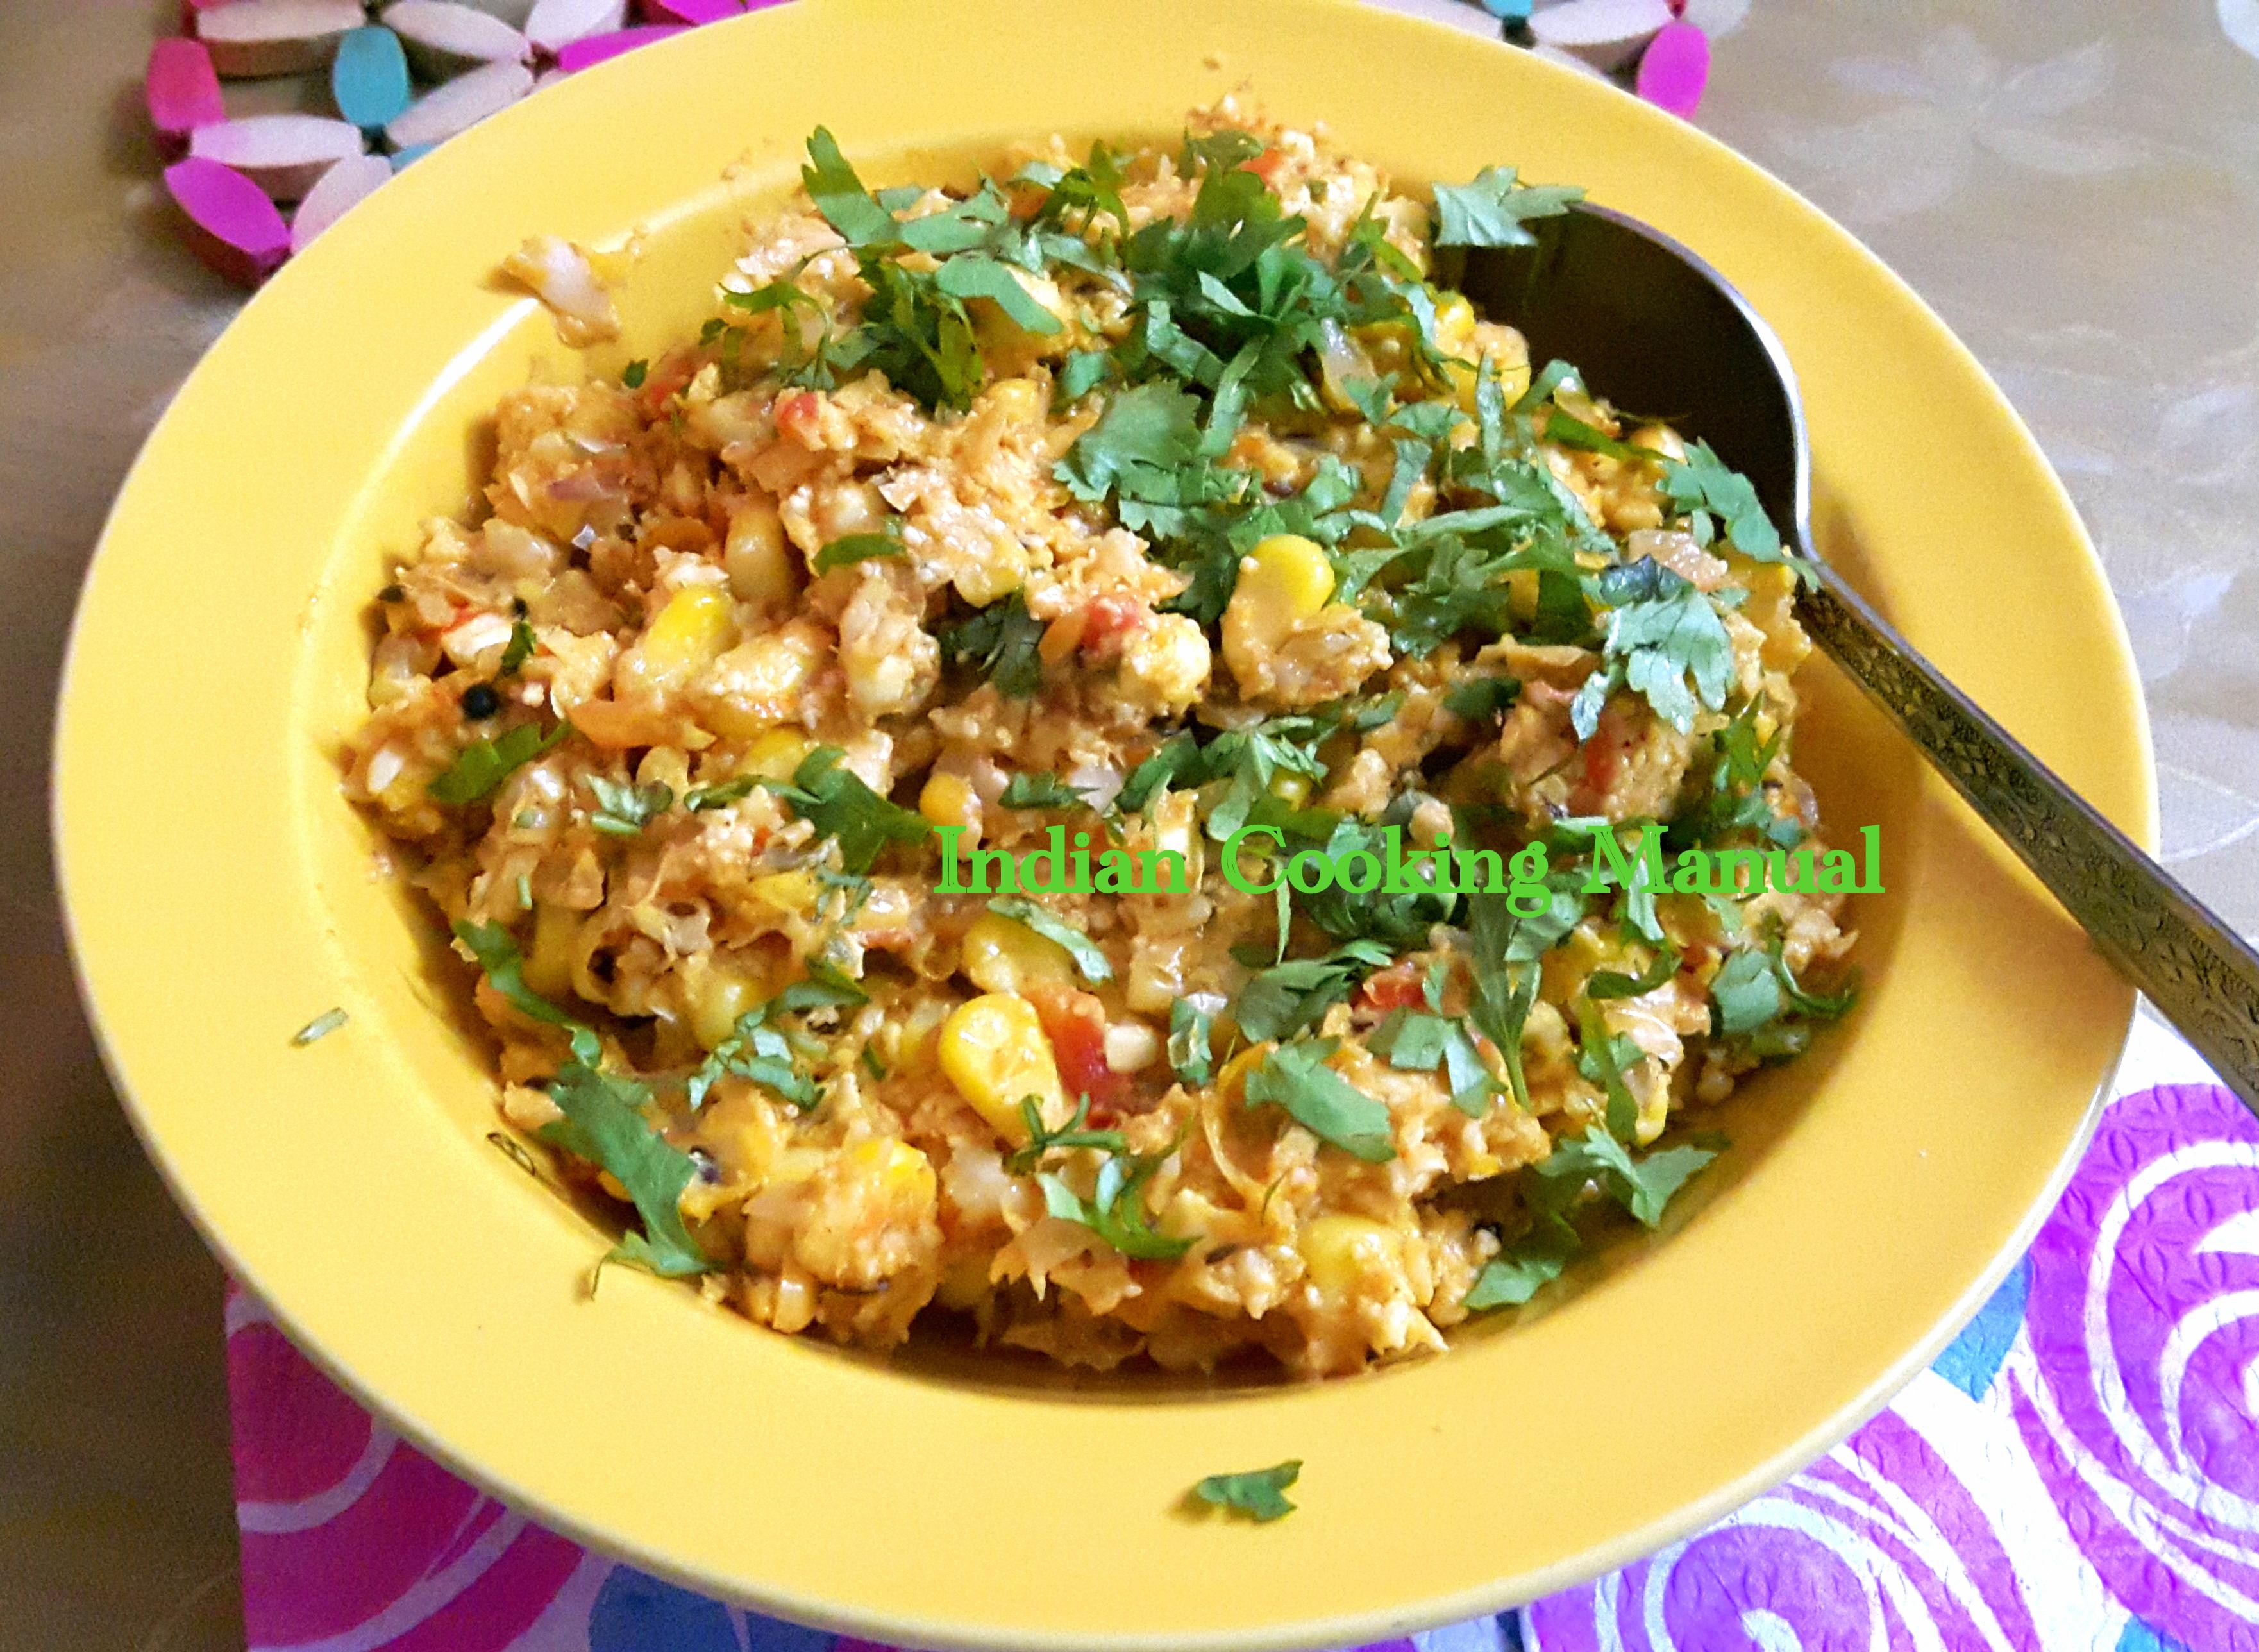 Corn paneer bhurji